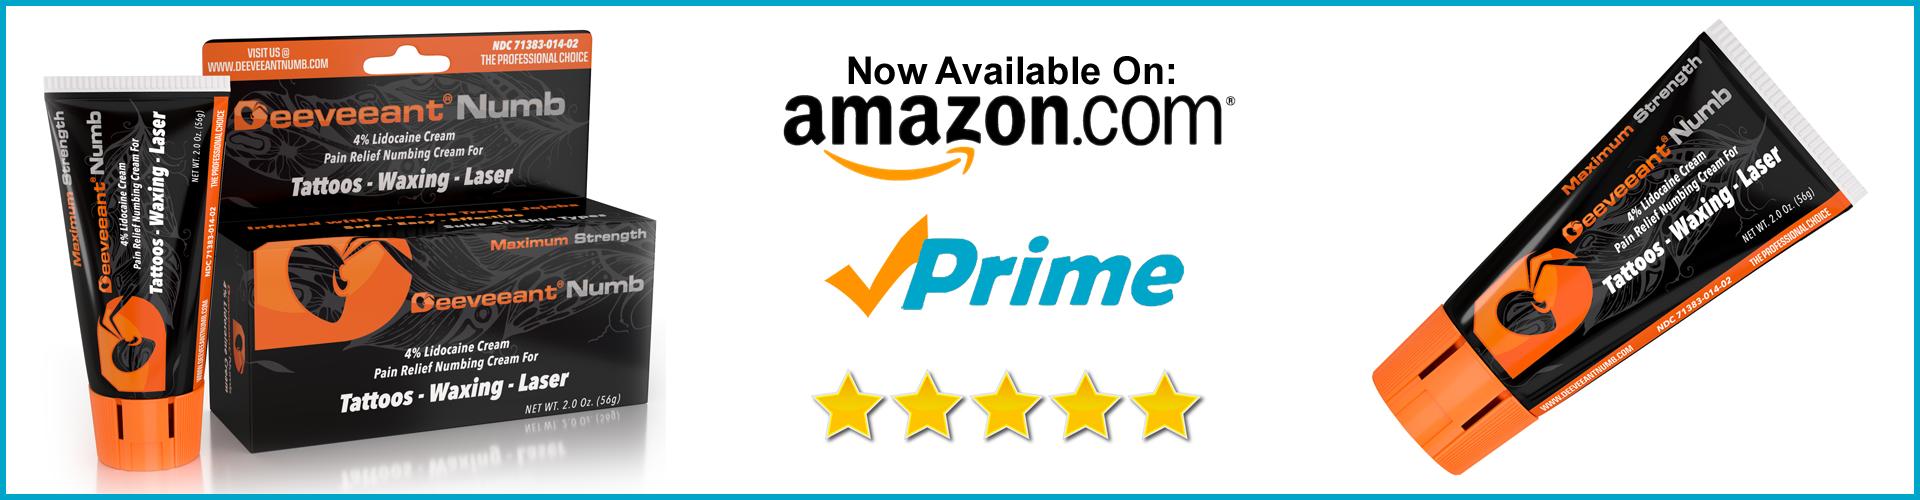 Deeveeant Numb Cream on Amazon